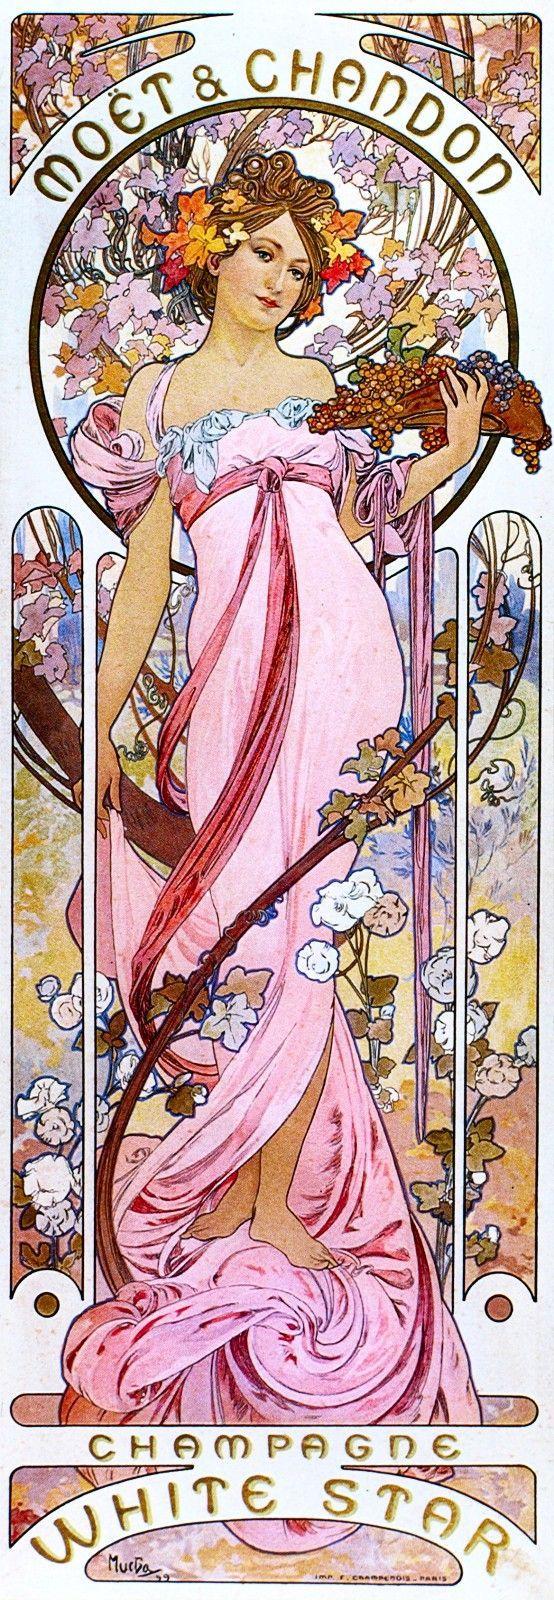 Art Nouveau Mucha Moët & Chandon Champagne White Star